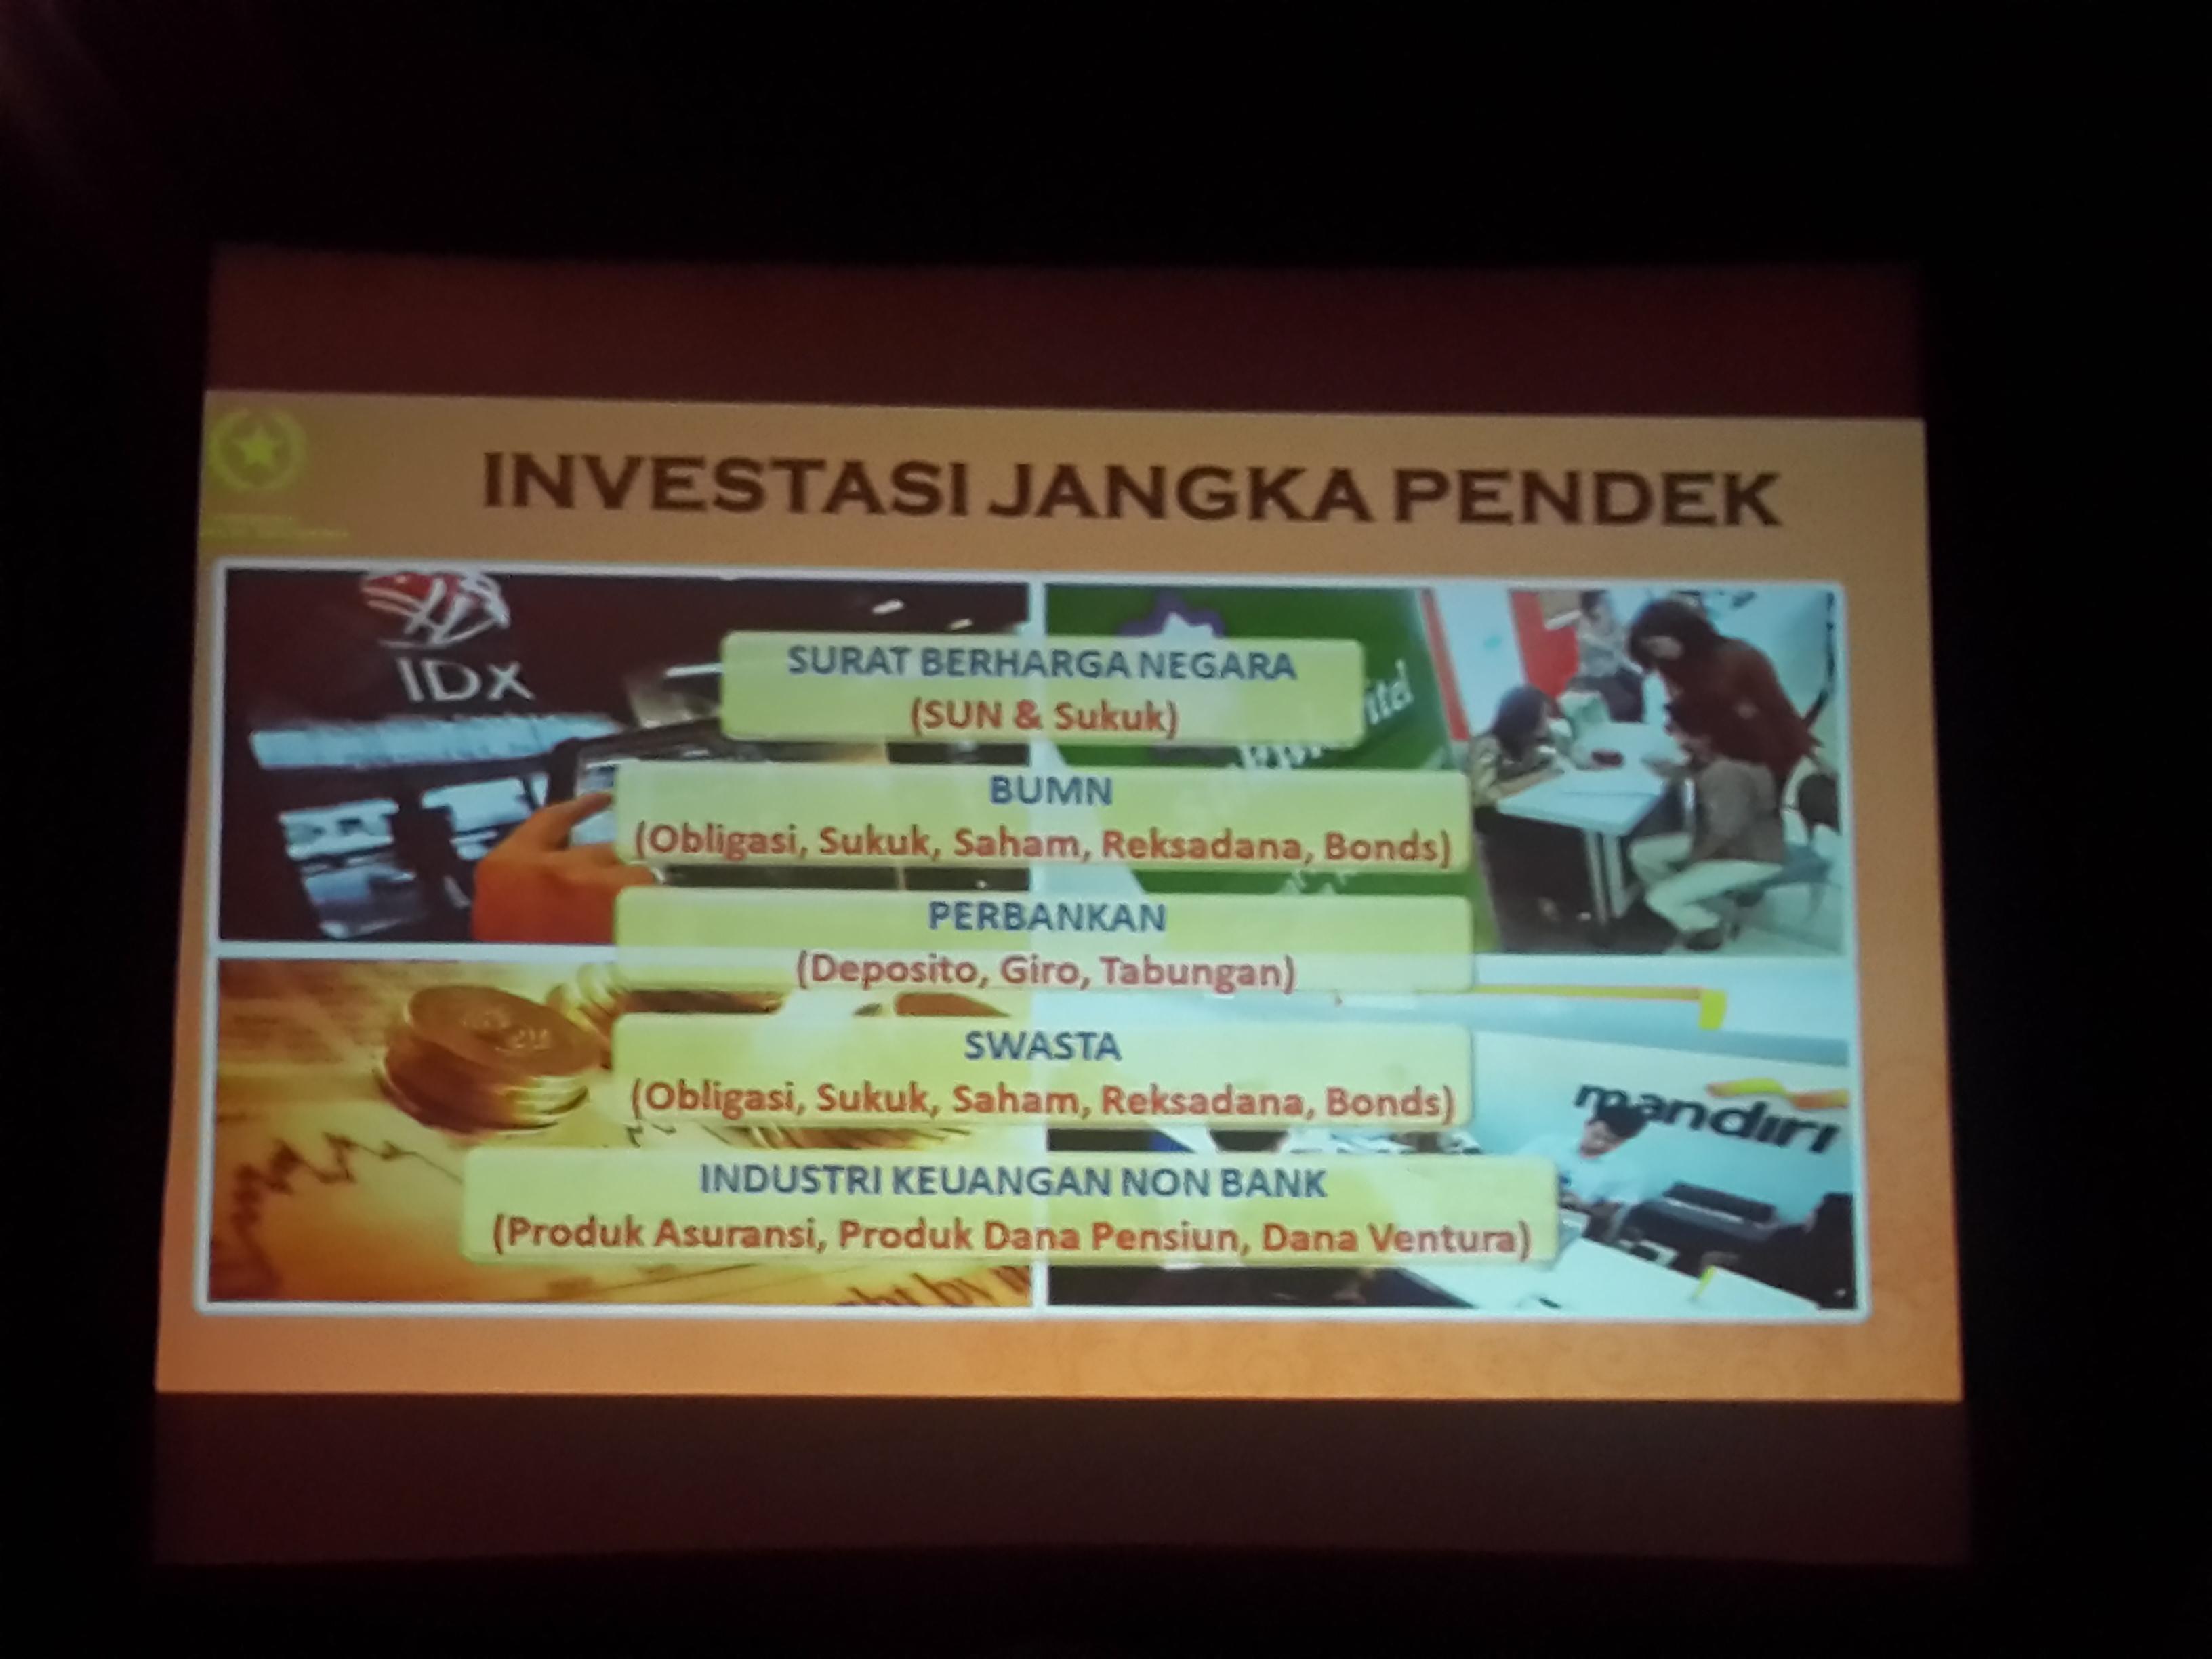 Presentasi Jokowi tentang Instrumen Investasi Jangka Pendek Dana Tax Amnesty. Foto oleh Uni Lubis/Rappler